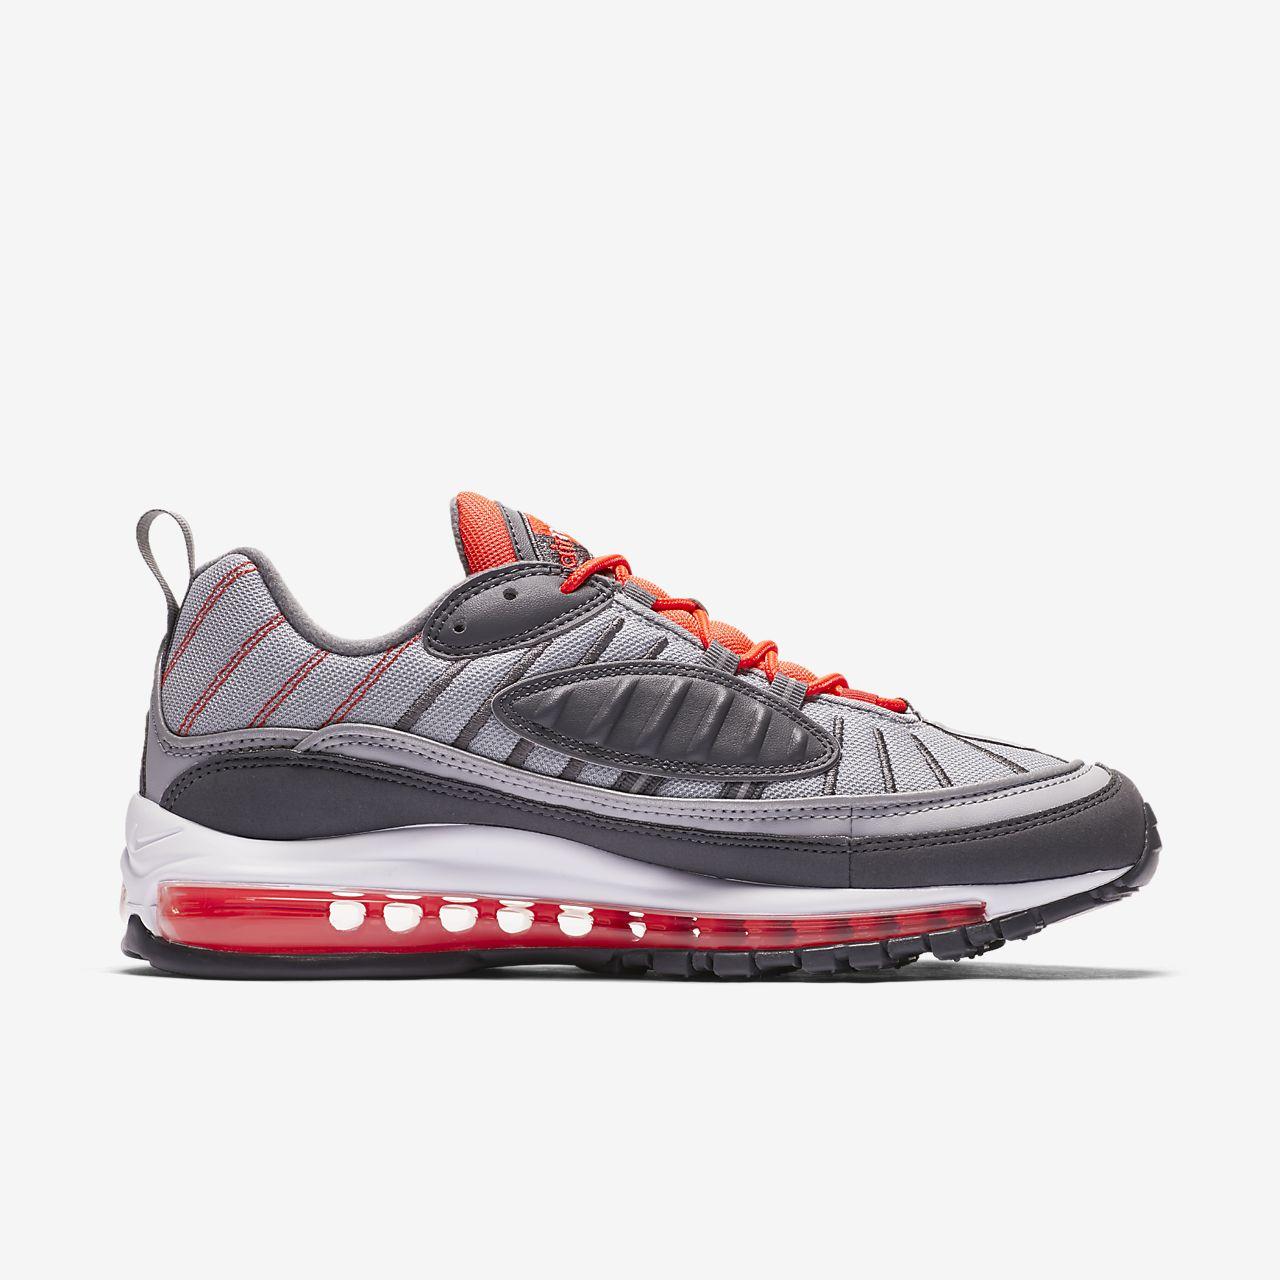 Nike Air Max 98 Chaussures De Sport - Rouge vAeM4W